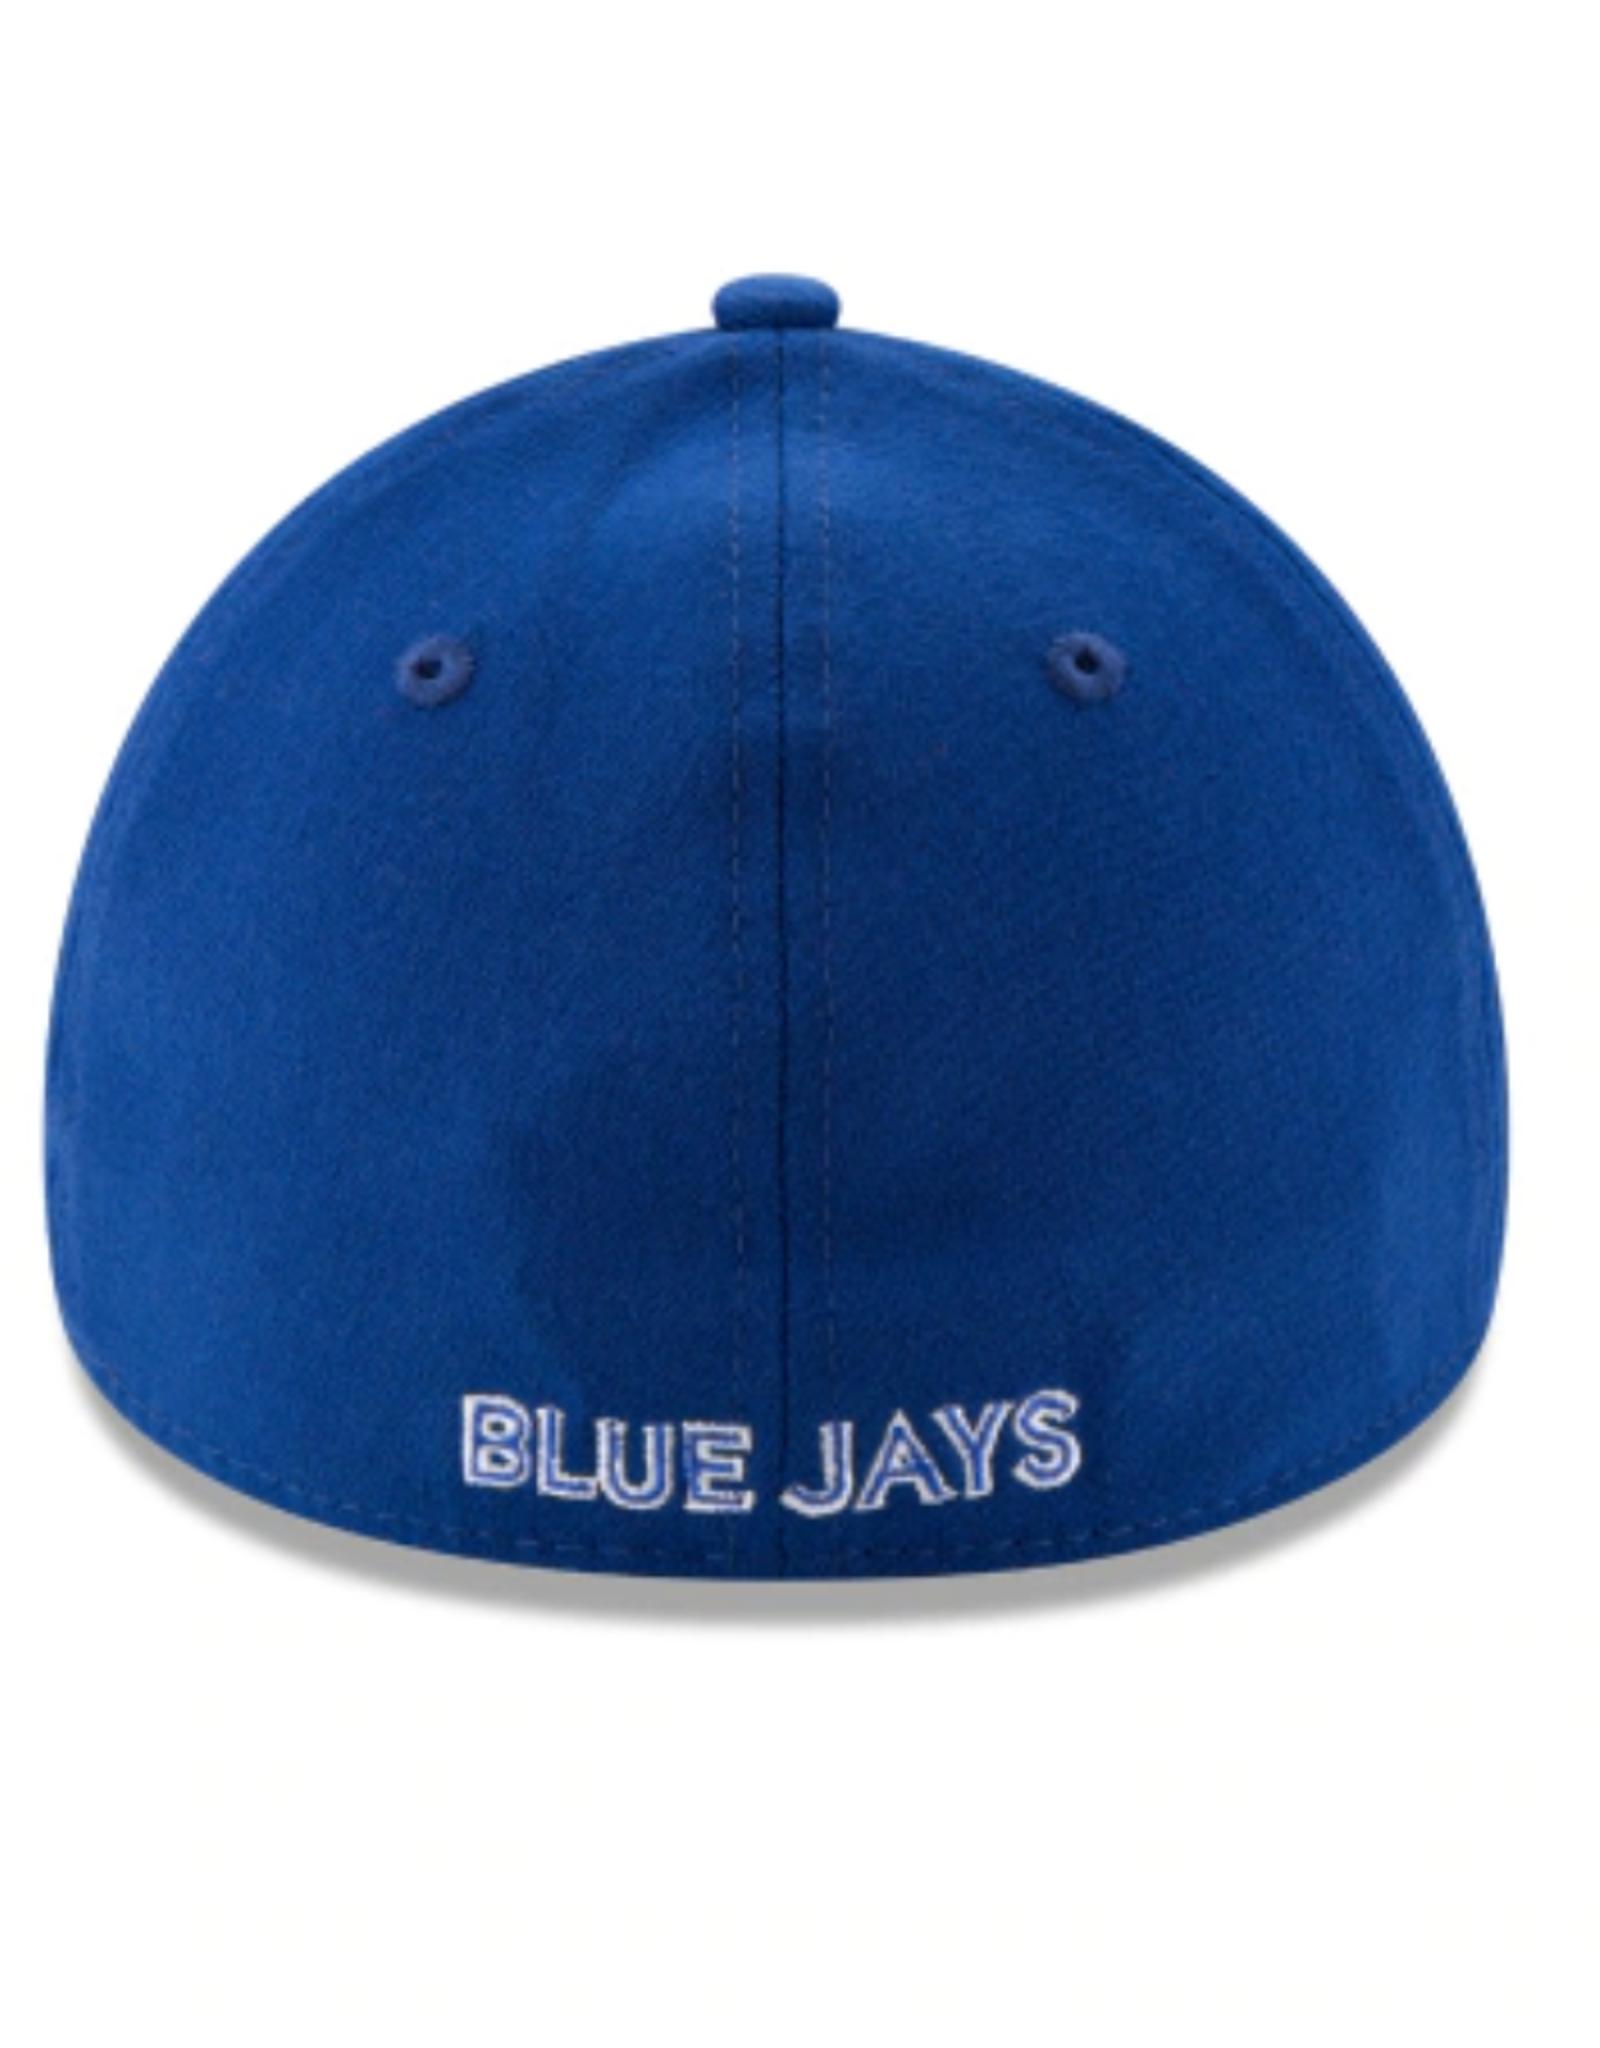 New Era Youth 39THIRTY Hat Toronto Blue Jays Royal